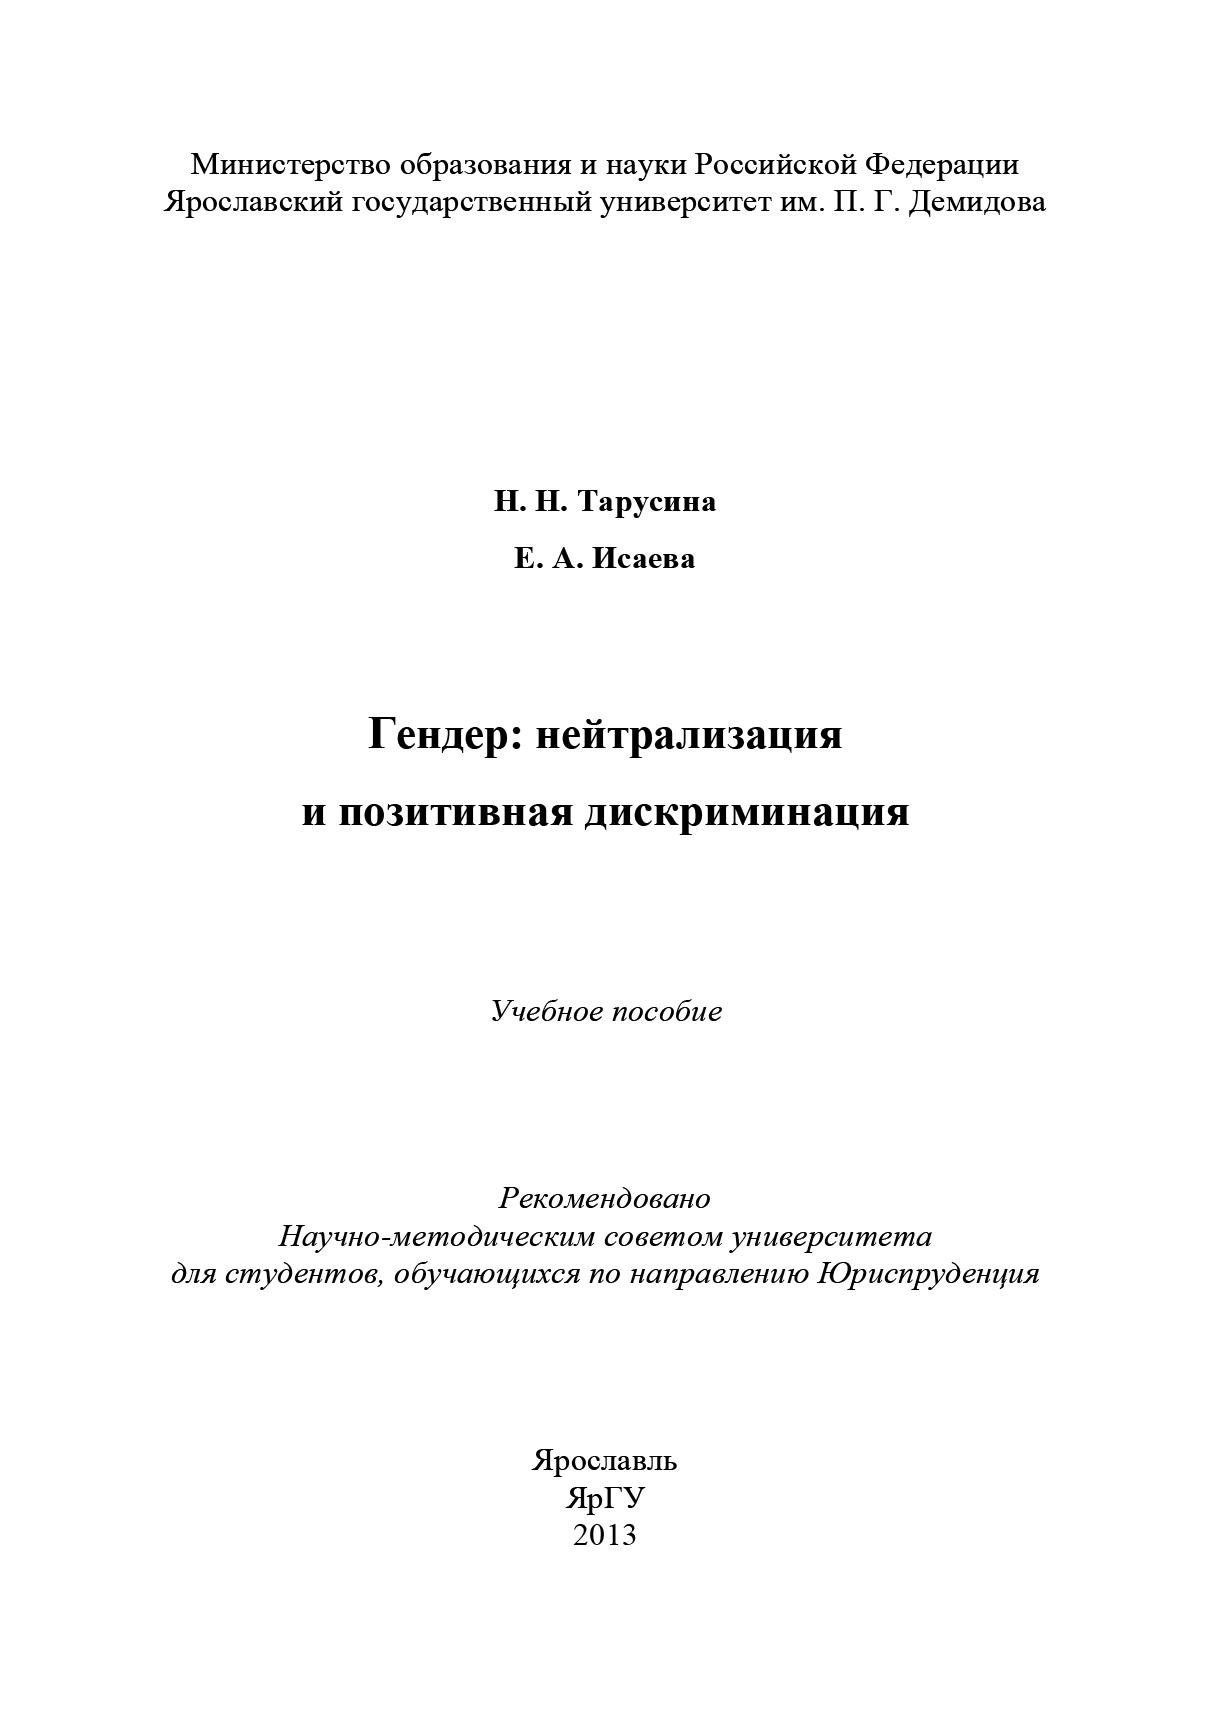 Н. Н. Тарусина Гендер: нейтрализация и позитивная дискриминация лушников а лушникова м тарусина н гендер в законе монография